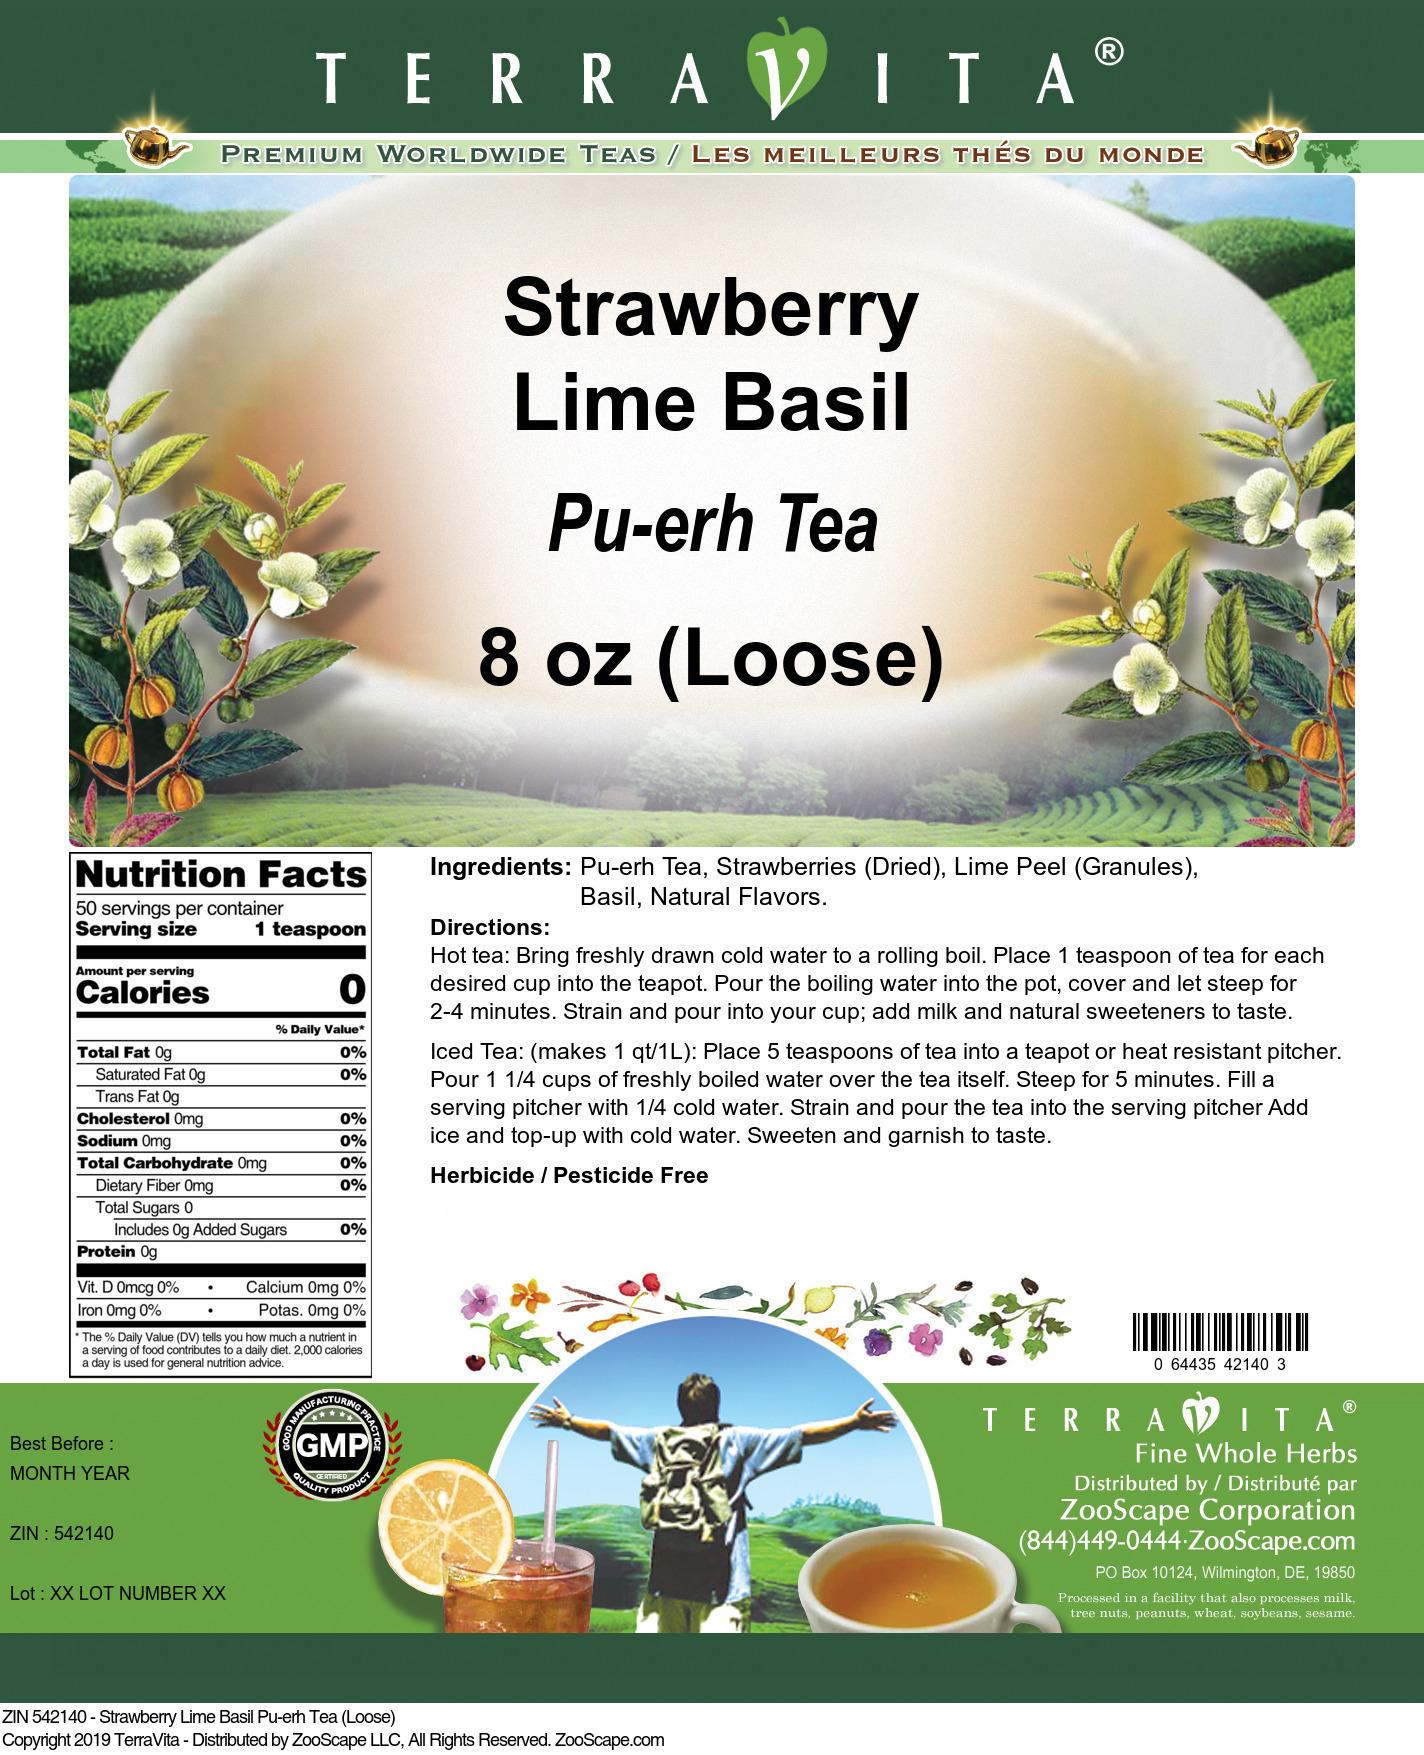 Strawberry Lime Basil Pu-erh Tea